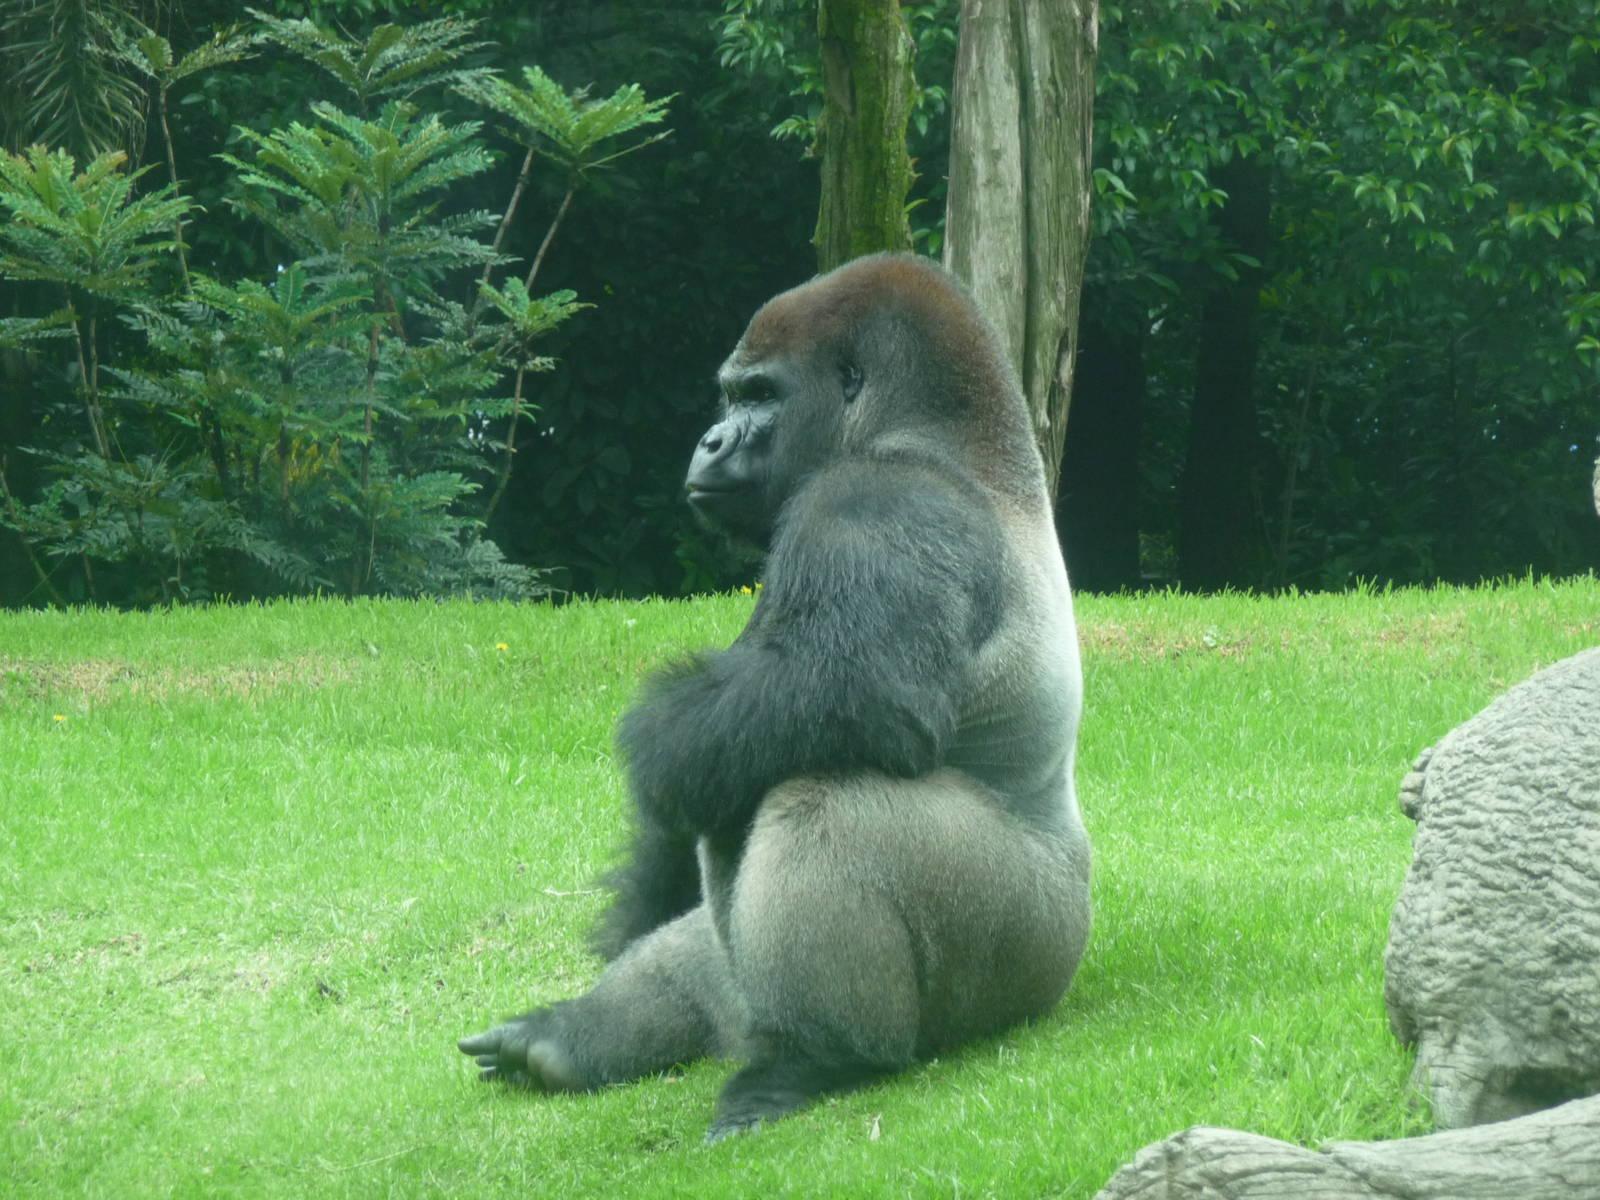 bantu male gorilla chapultepec